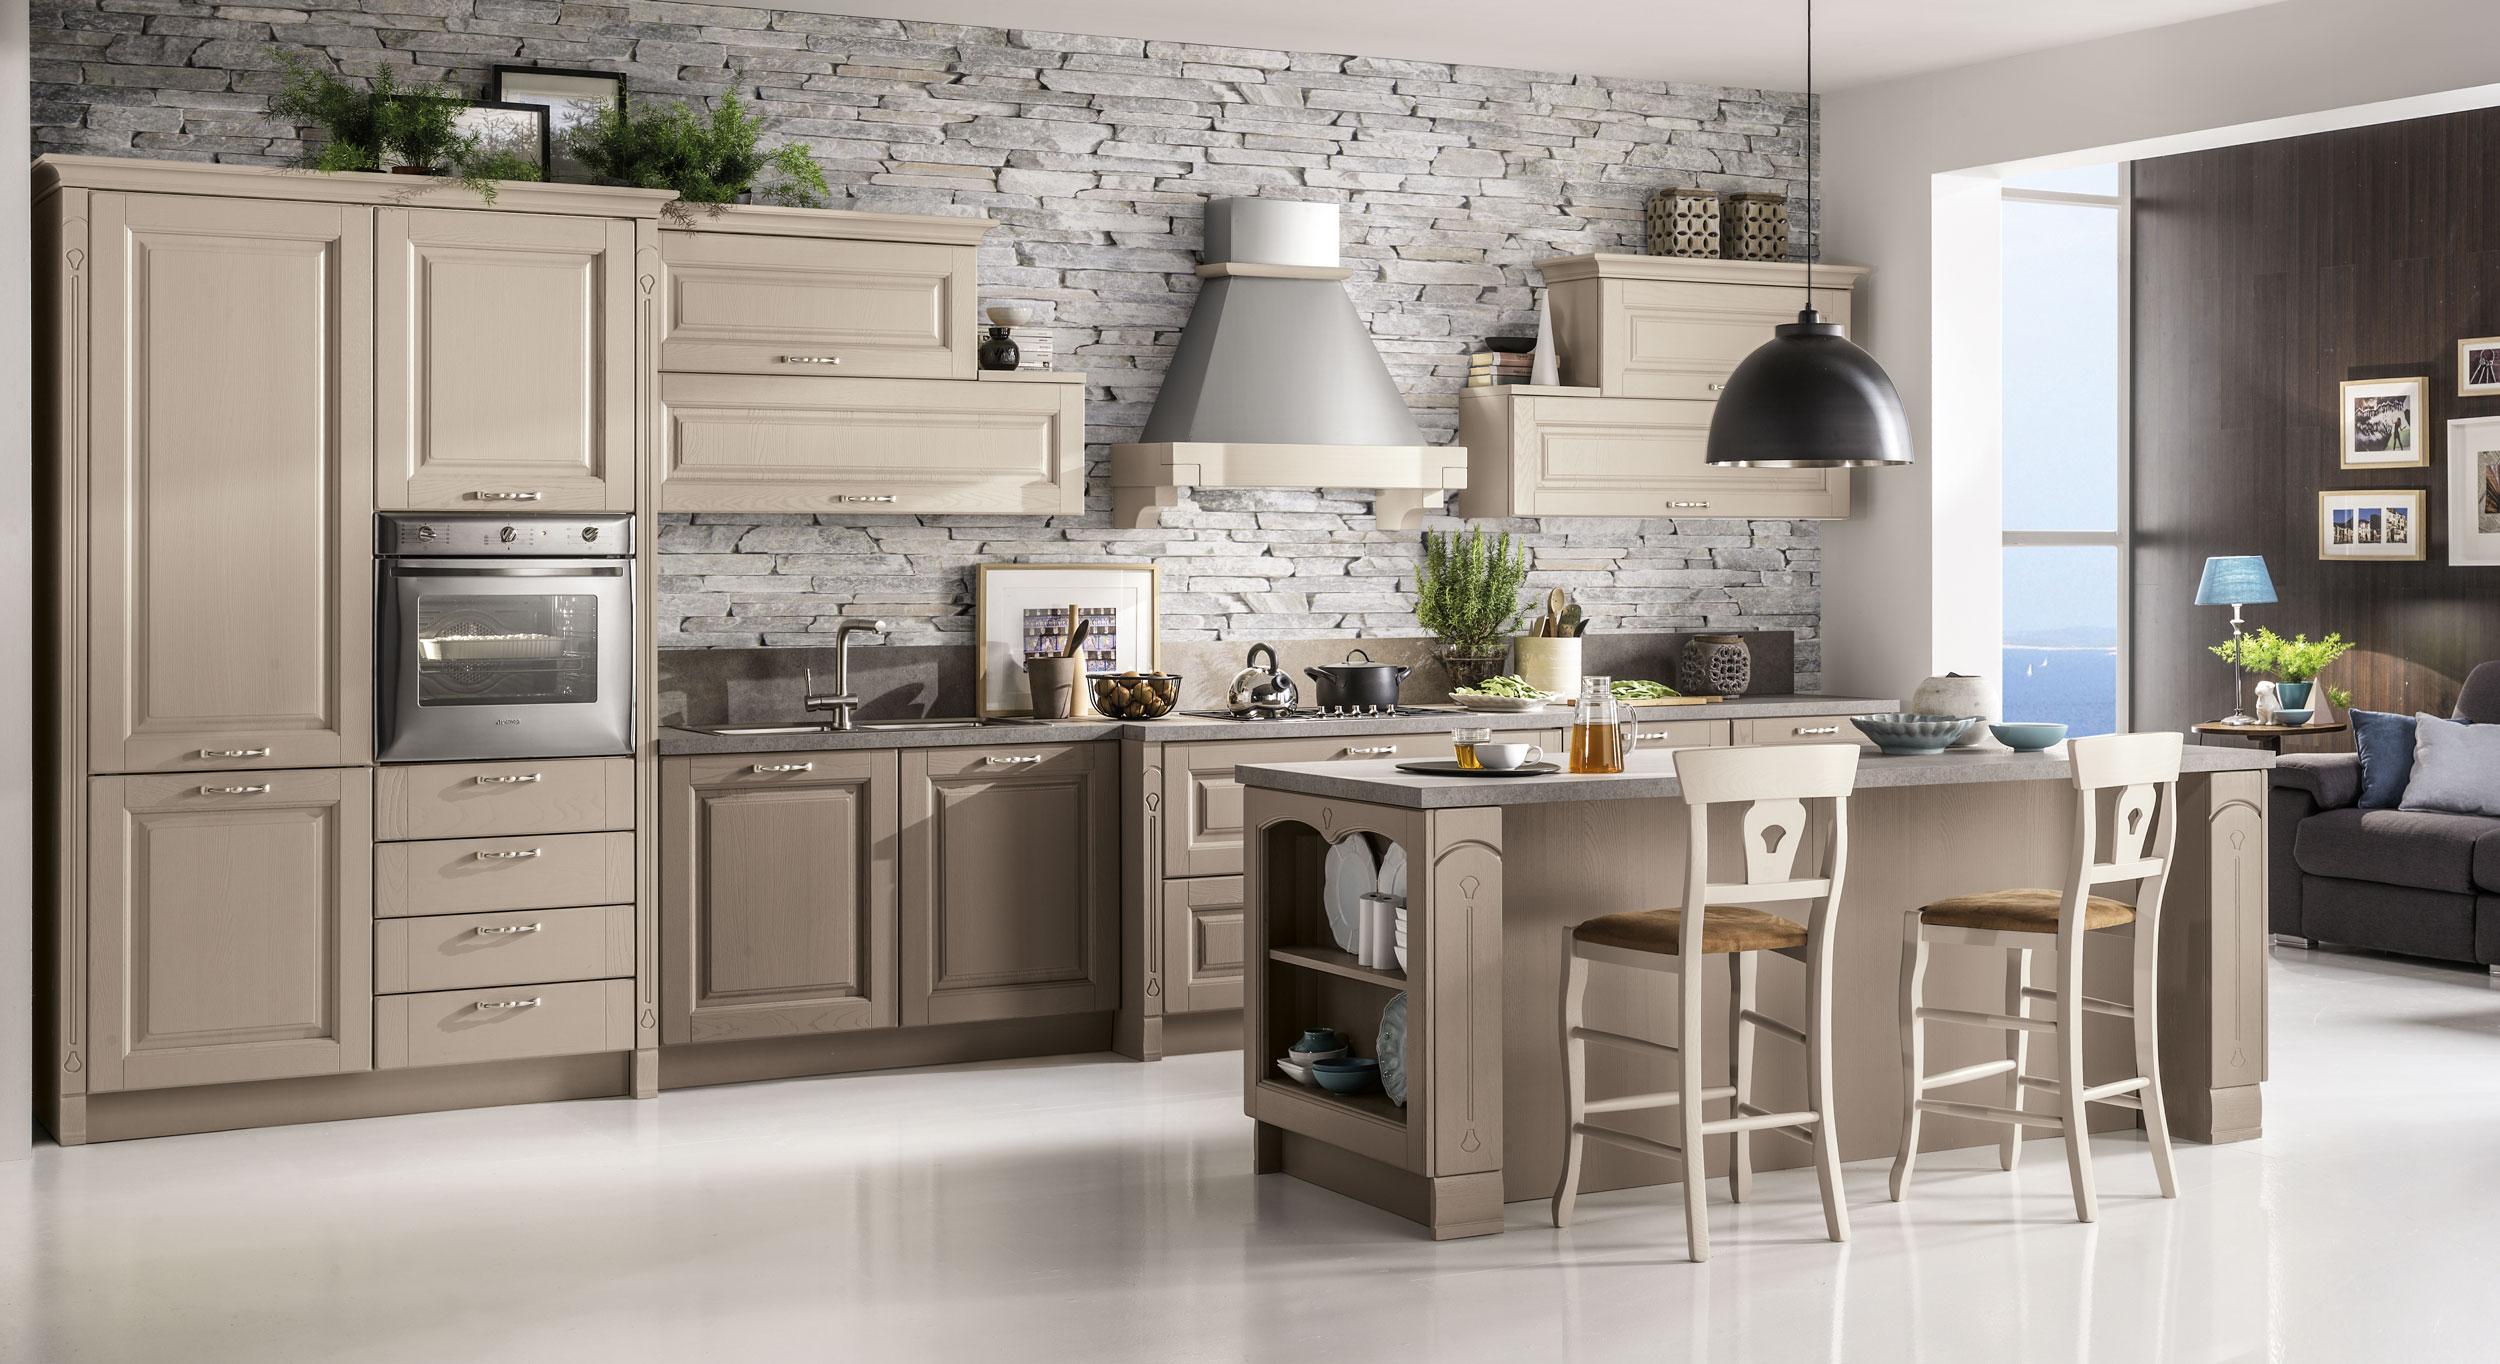 Cucina stosa bolgheri lorenzelli arredamenti for Catalogo cucine